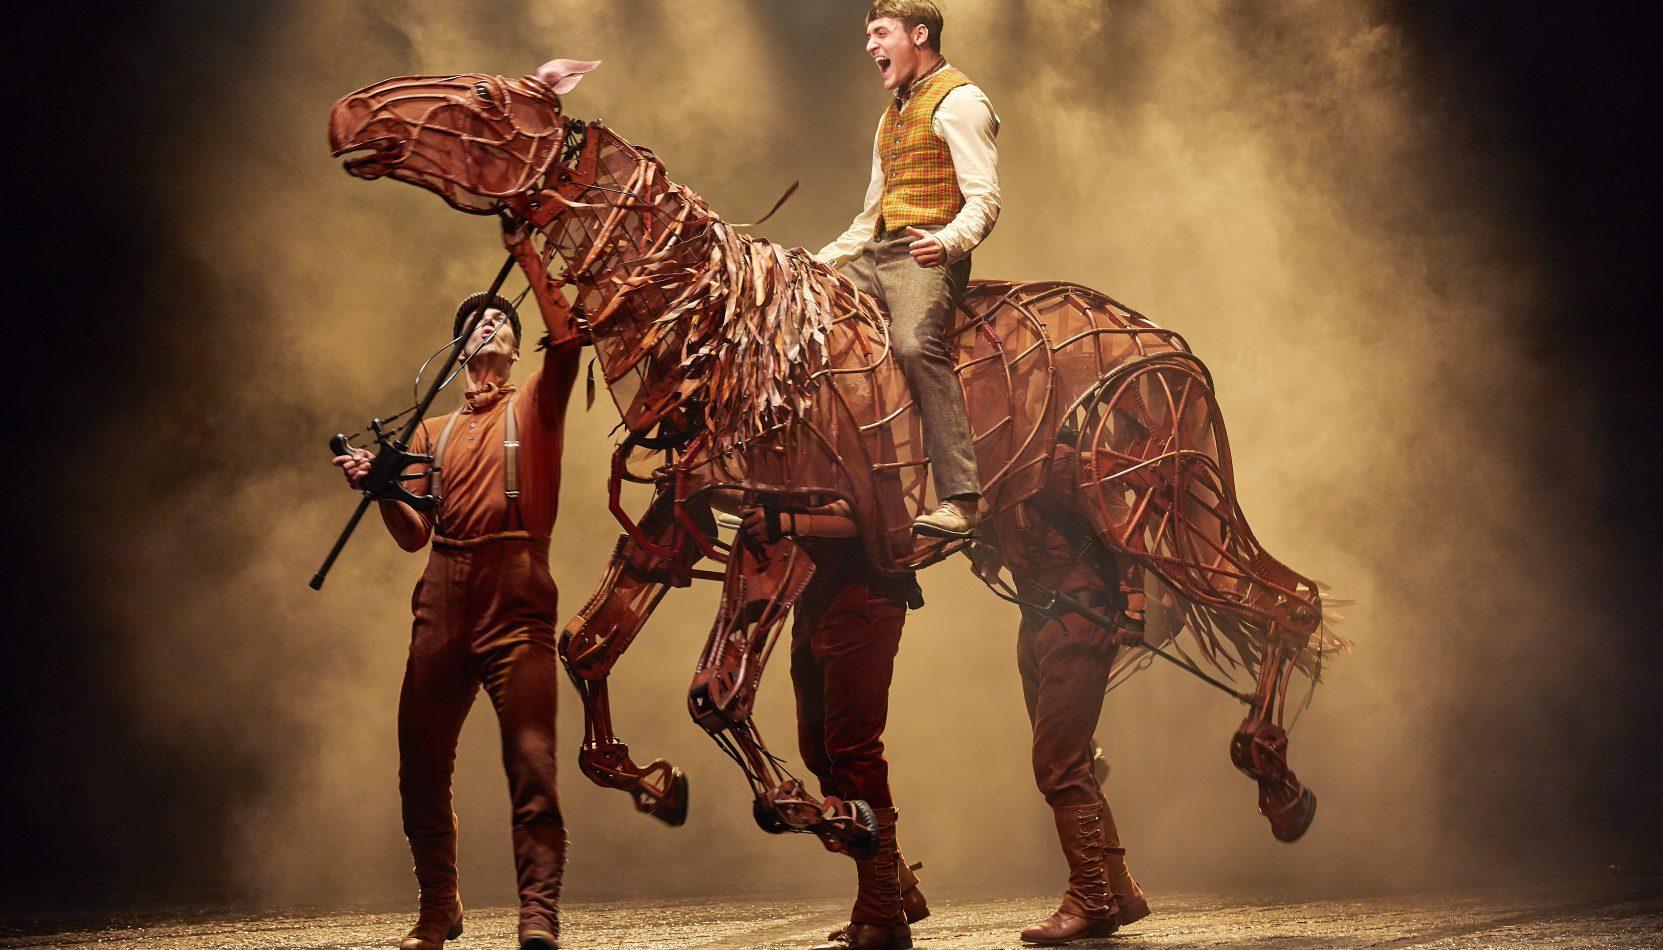 war horse, new victoria theatre, woking,surrey, theatre